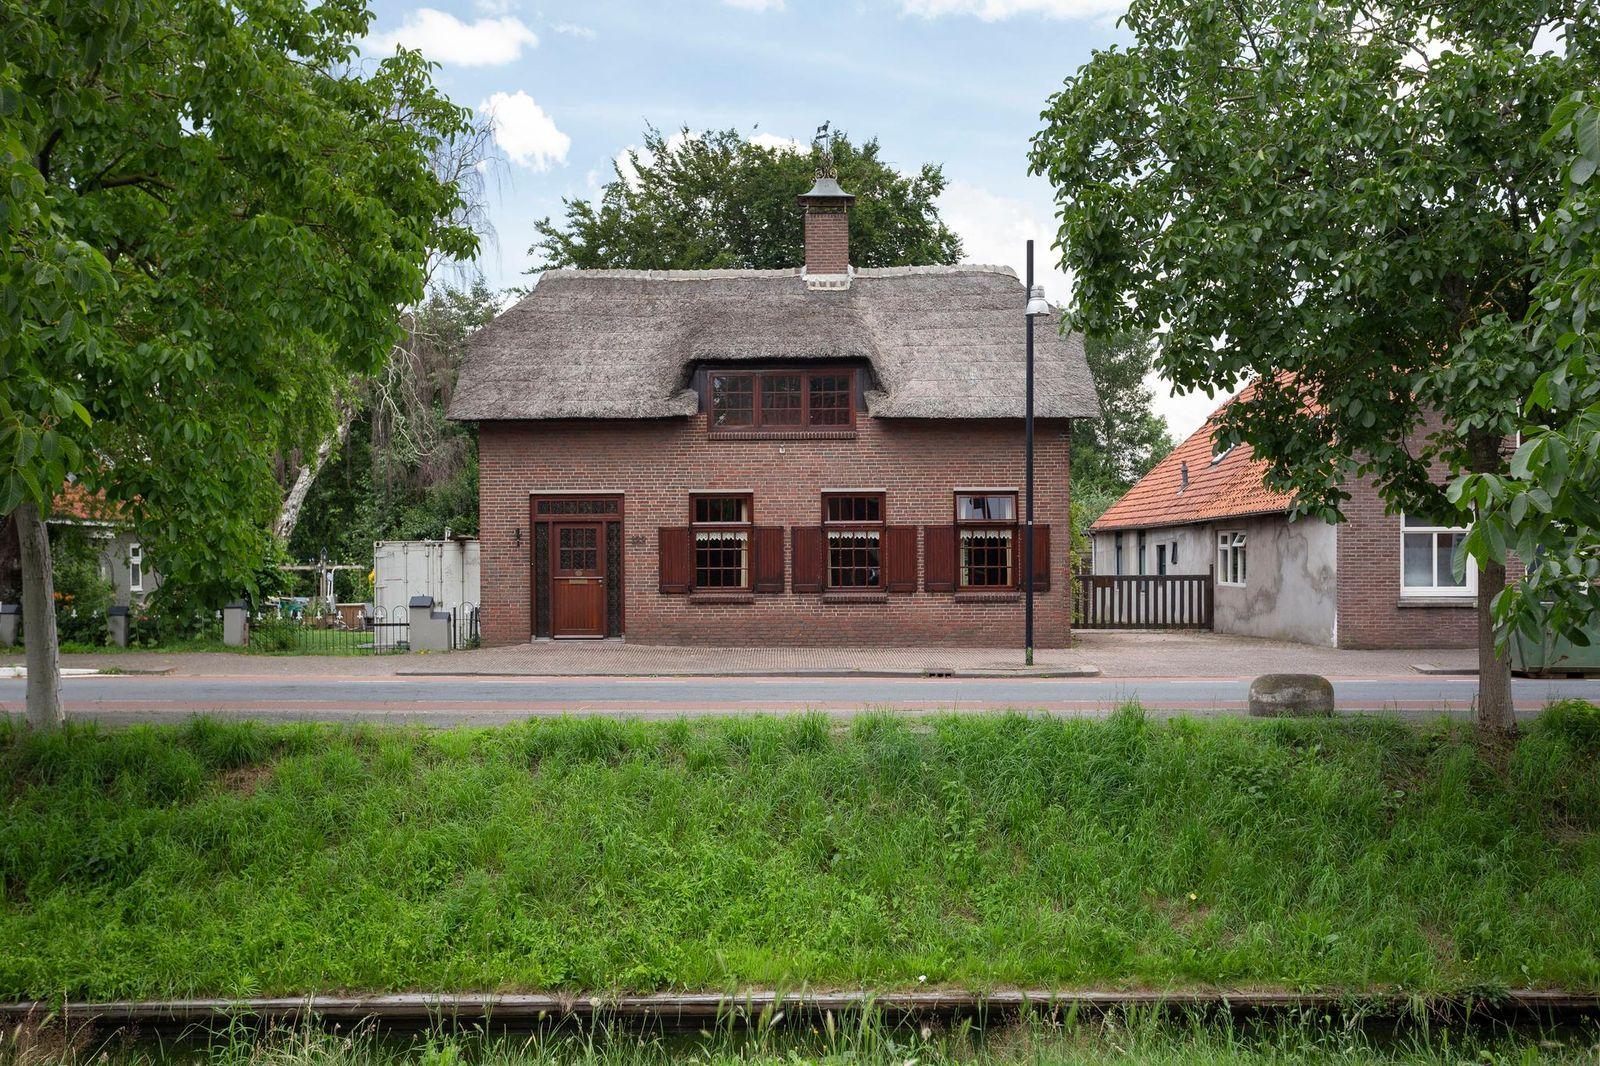 Wendelnesseweg-Oost 122, Sprang-capelle